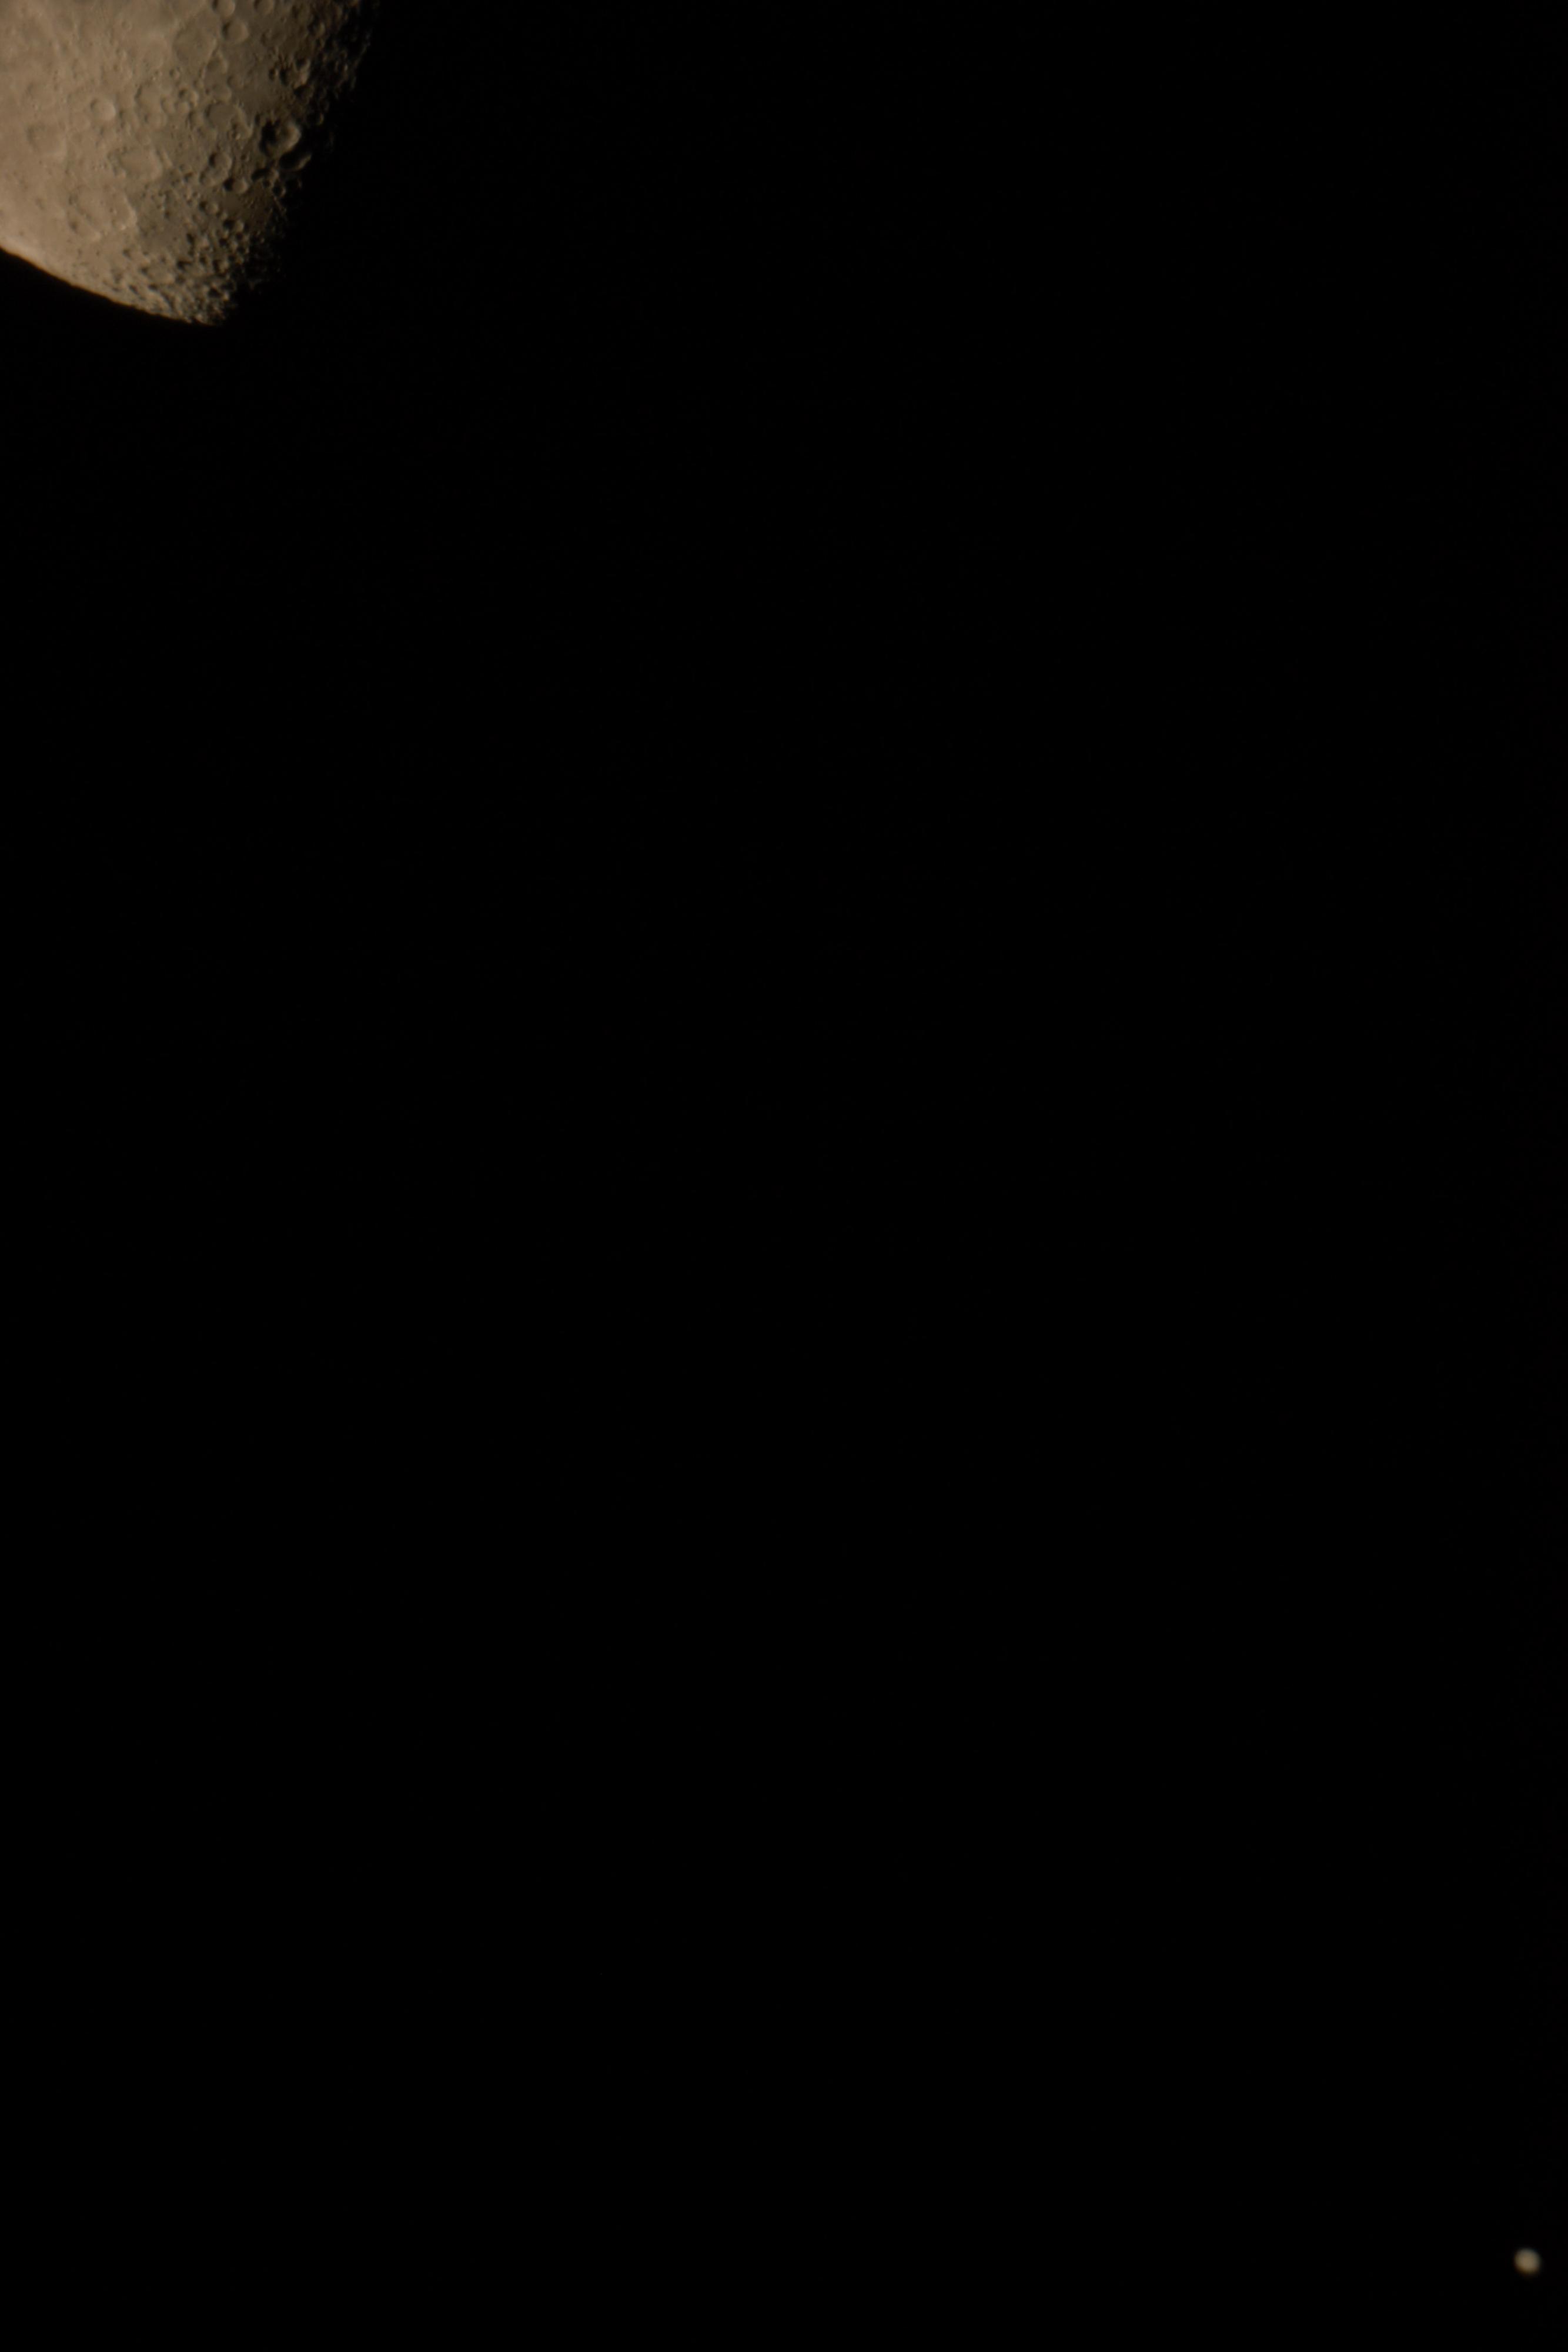 Conjonction Jupiter avec La Lune le 27 mars 2019.jpg